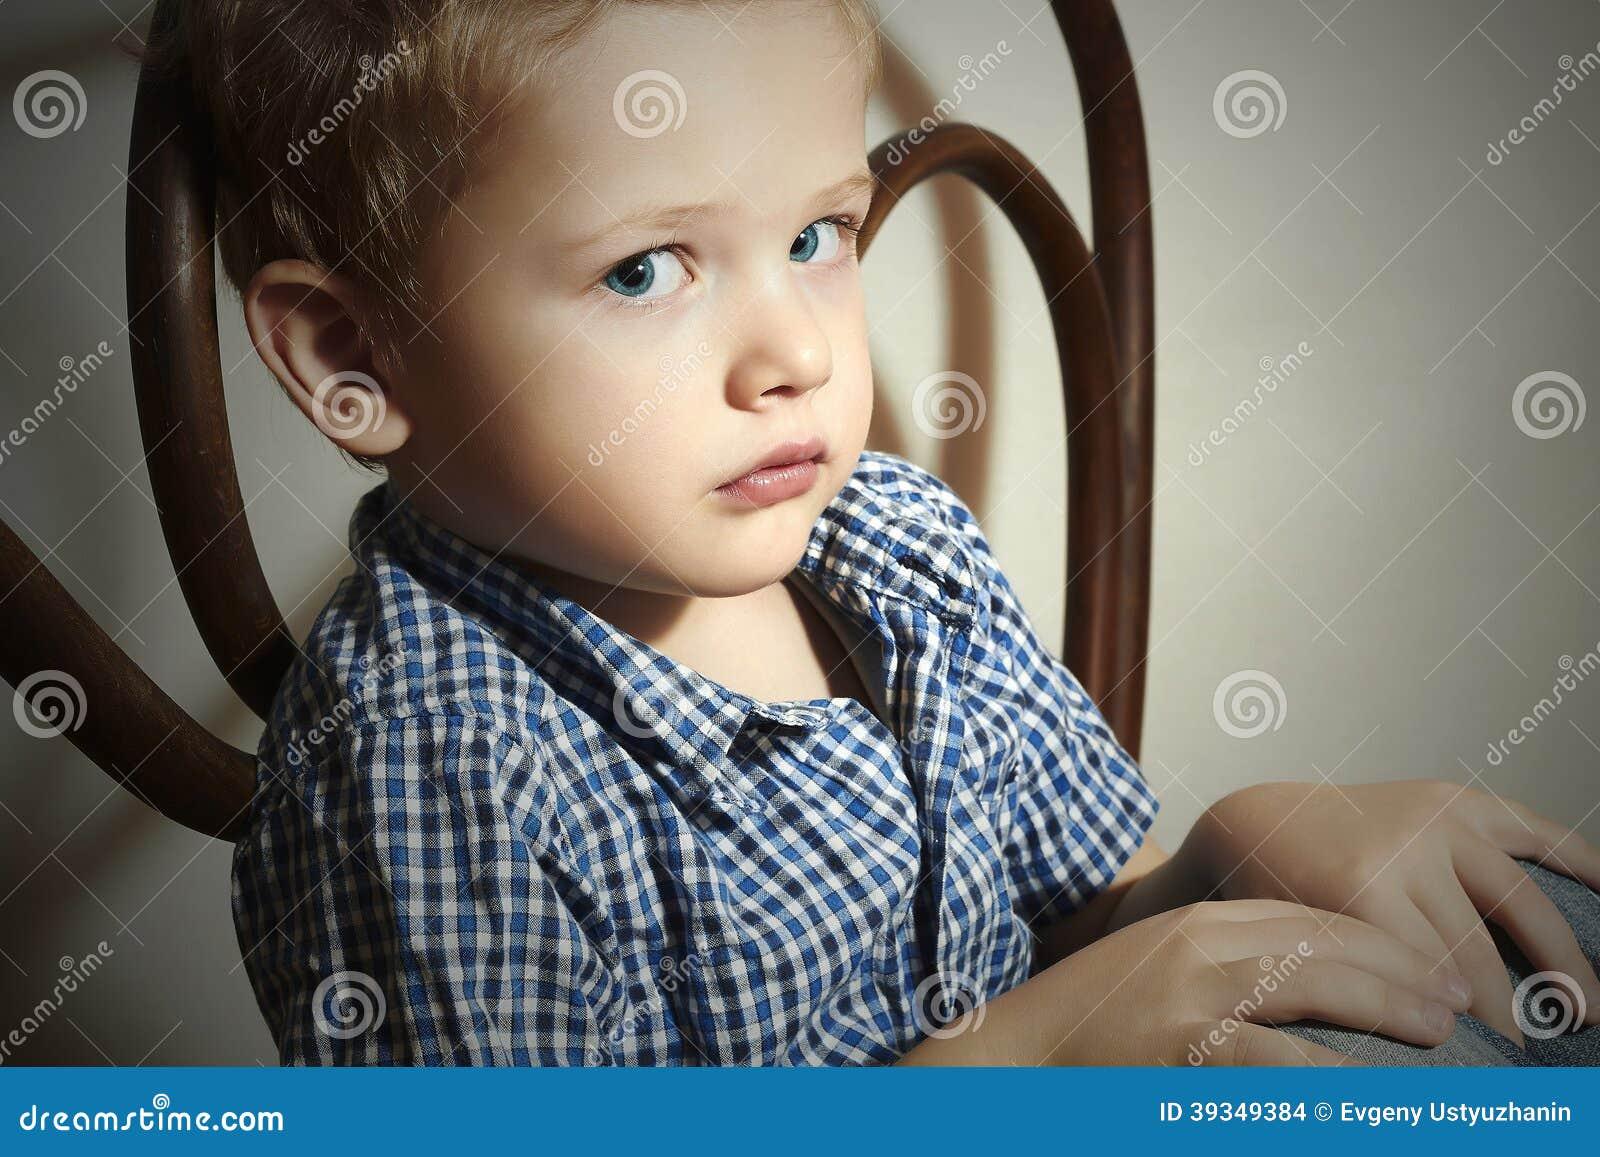 Child Sad Little Boy Fashion Children Emotion Stock Photo